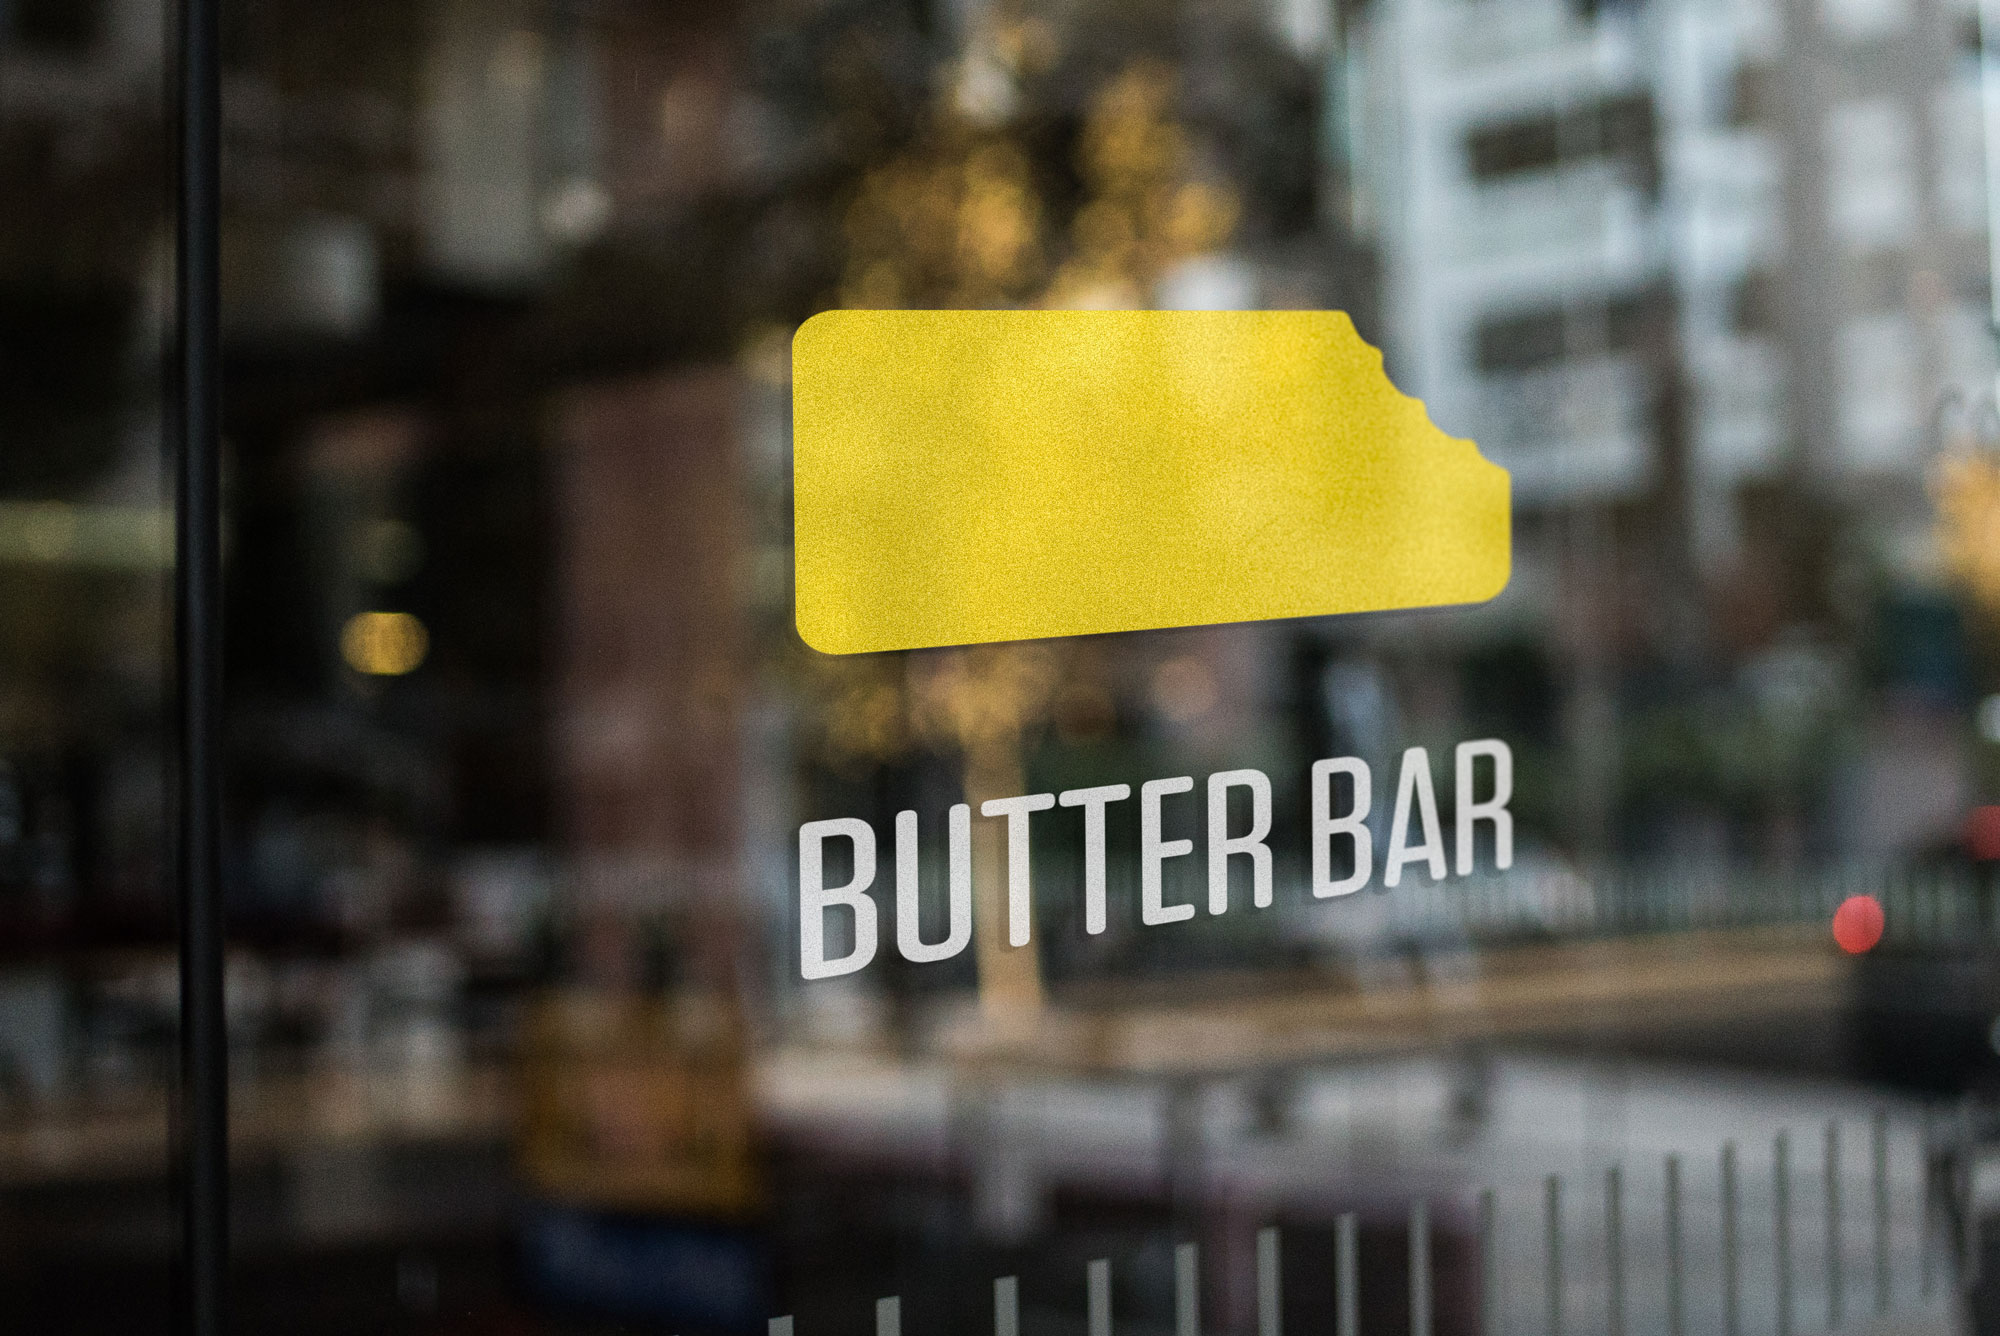 butter bar logo on glass